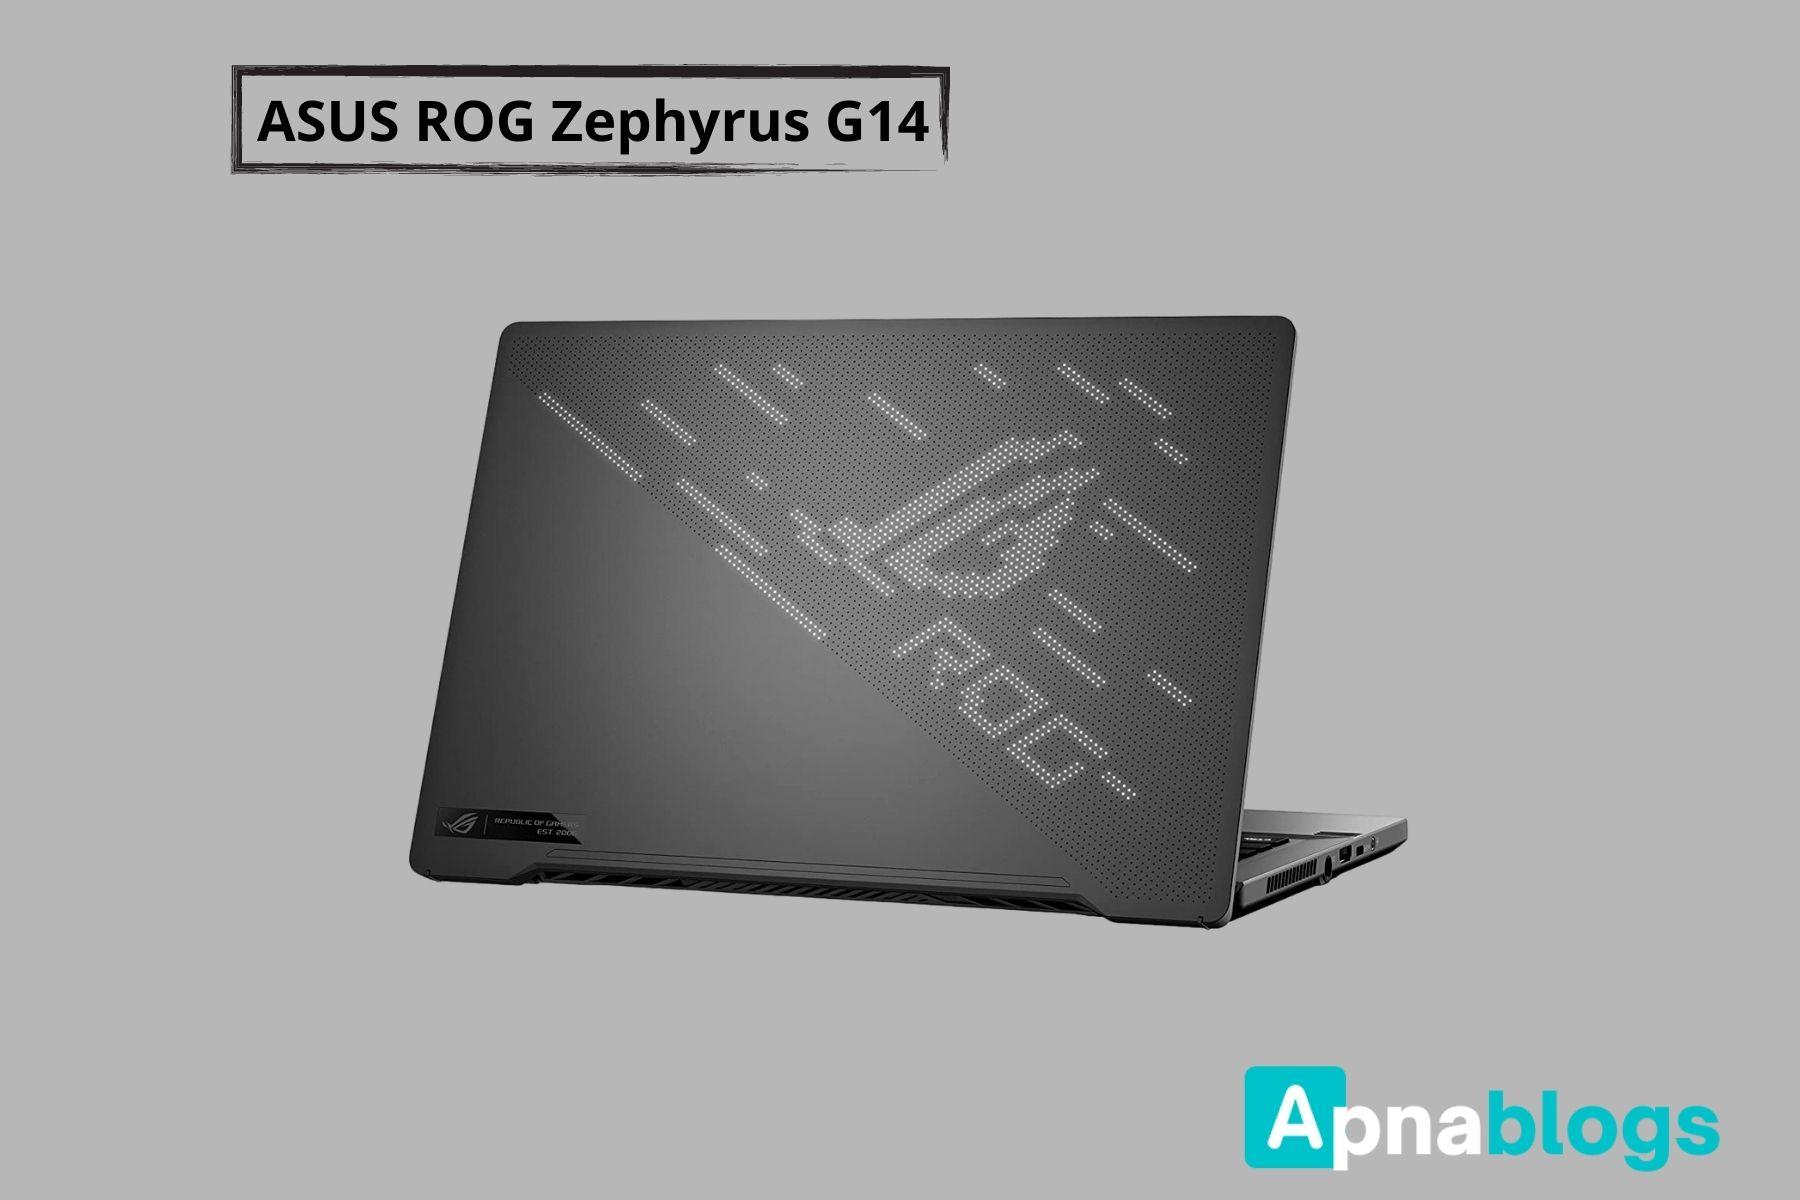 ASUS ROG Zephyrus G14